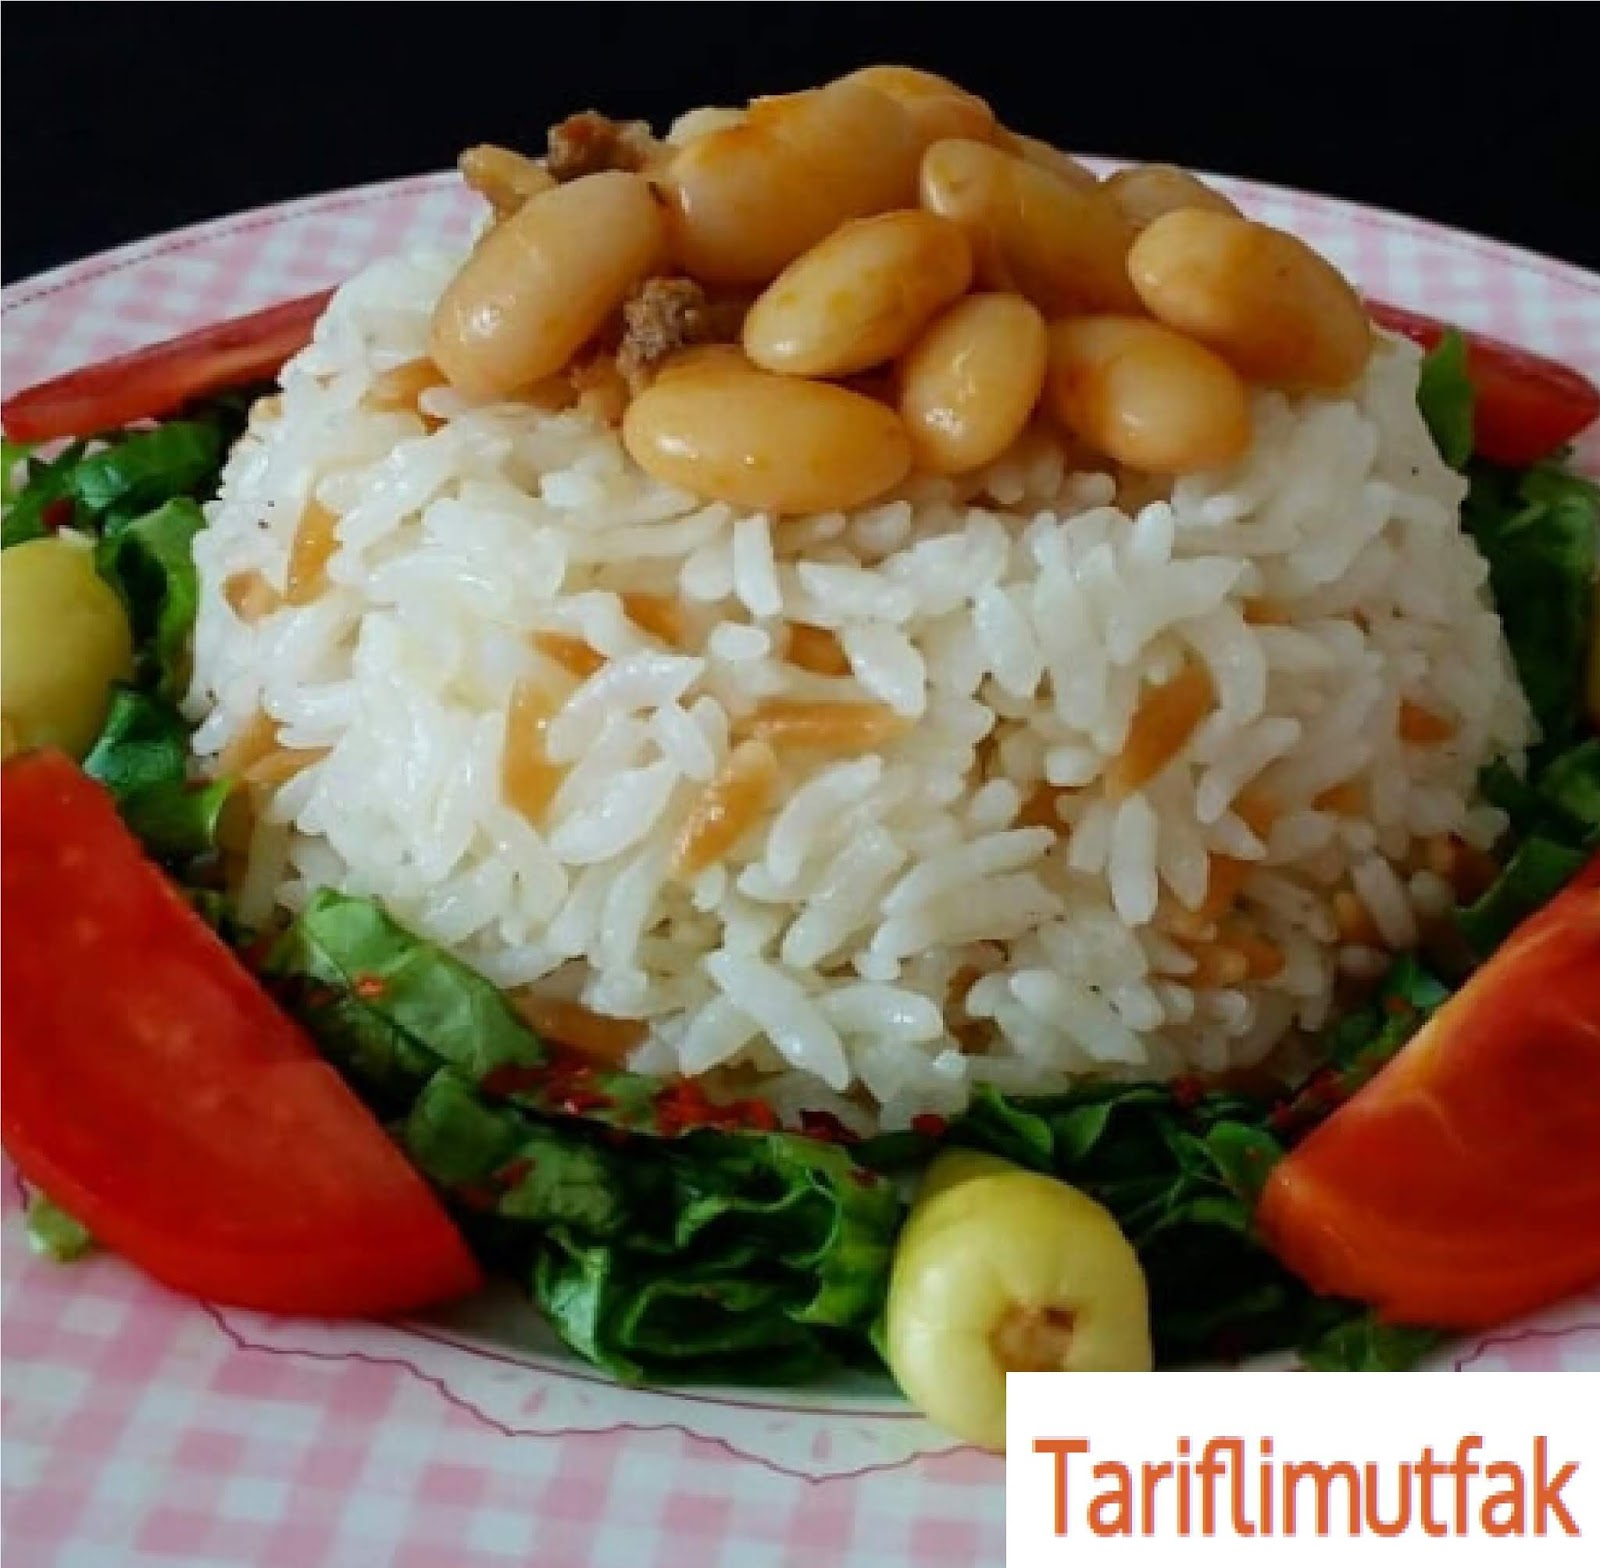 Arpa Şehriyeli Pirinç Pilavı Videosu